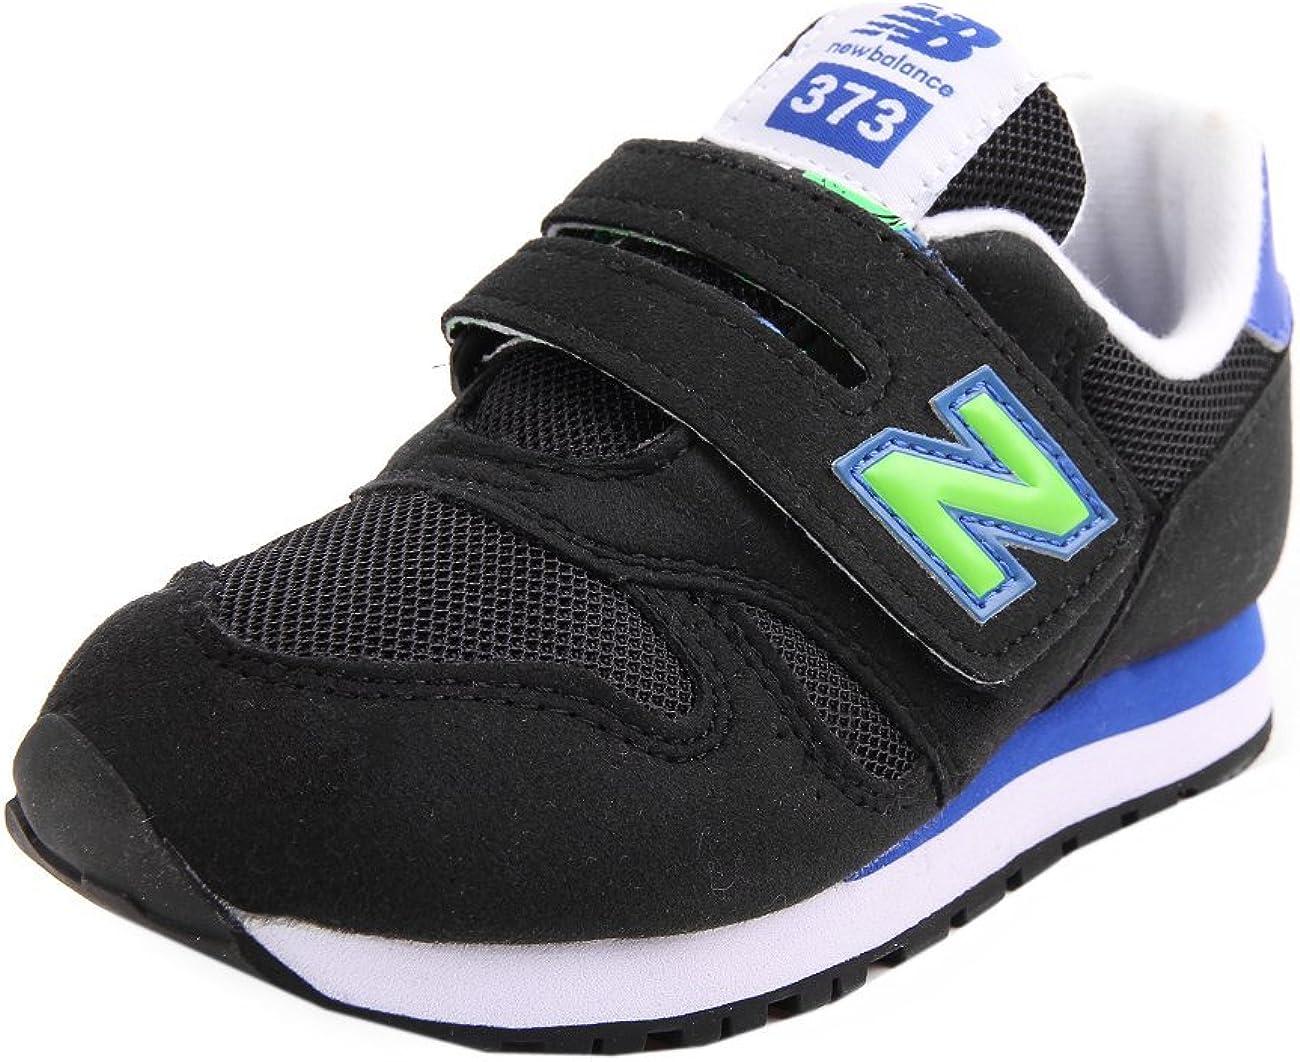 New Balance KV 373 TNY Black Royal 33: Amazon.co.uk: Shoes & Bags